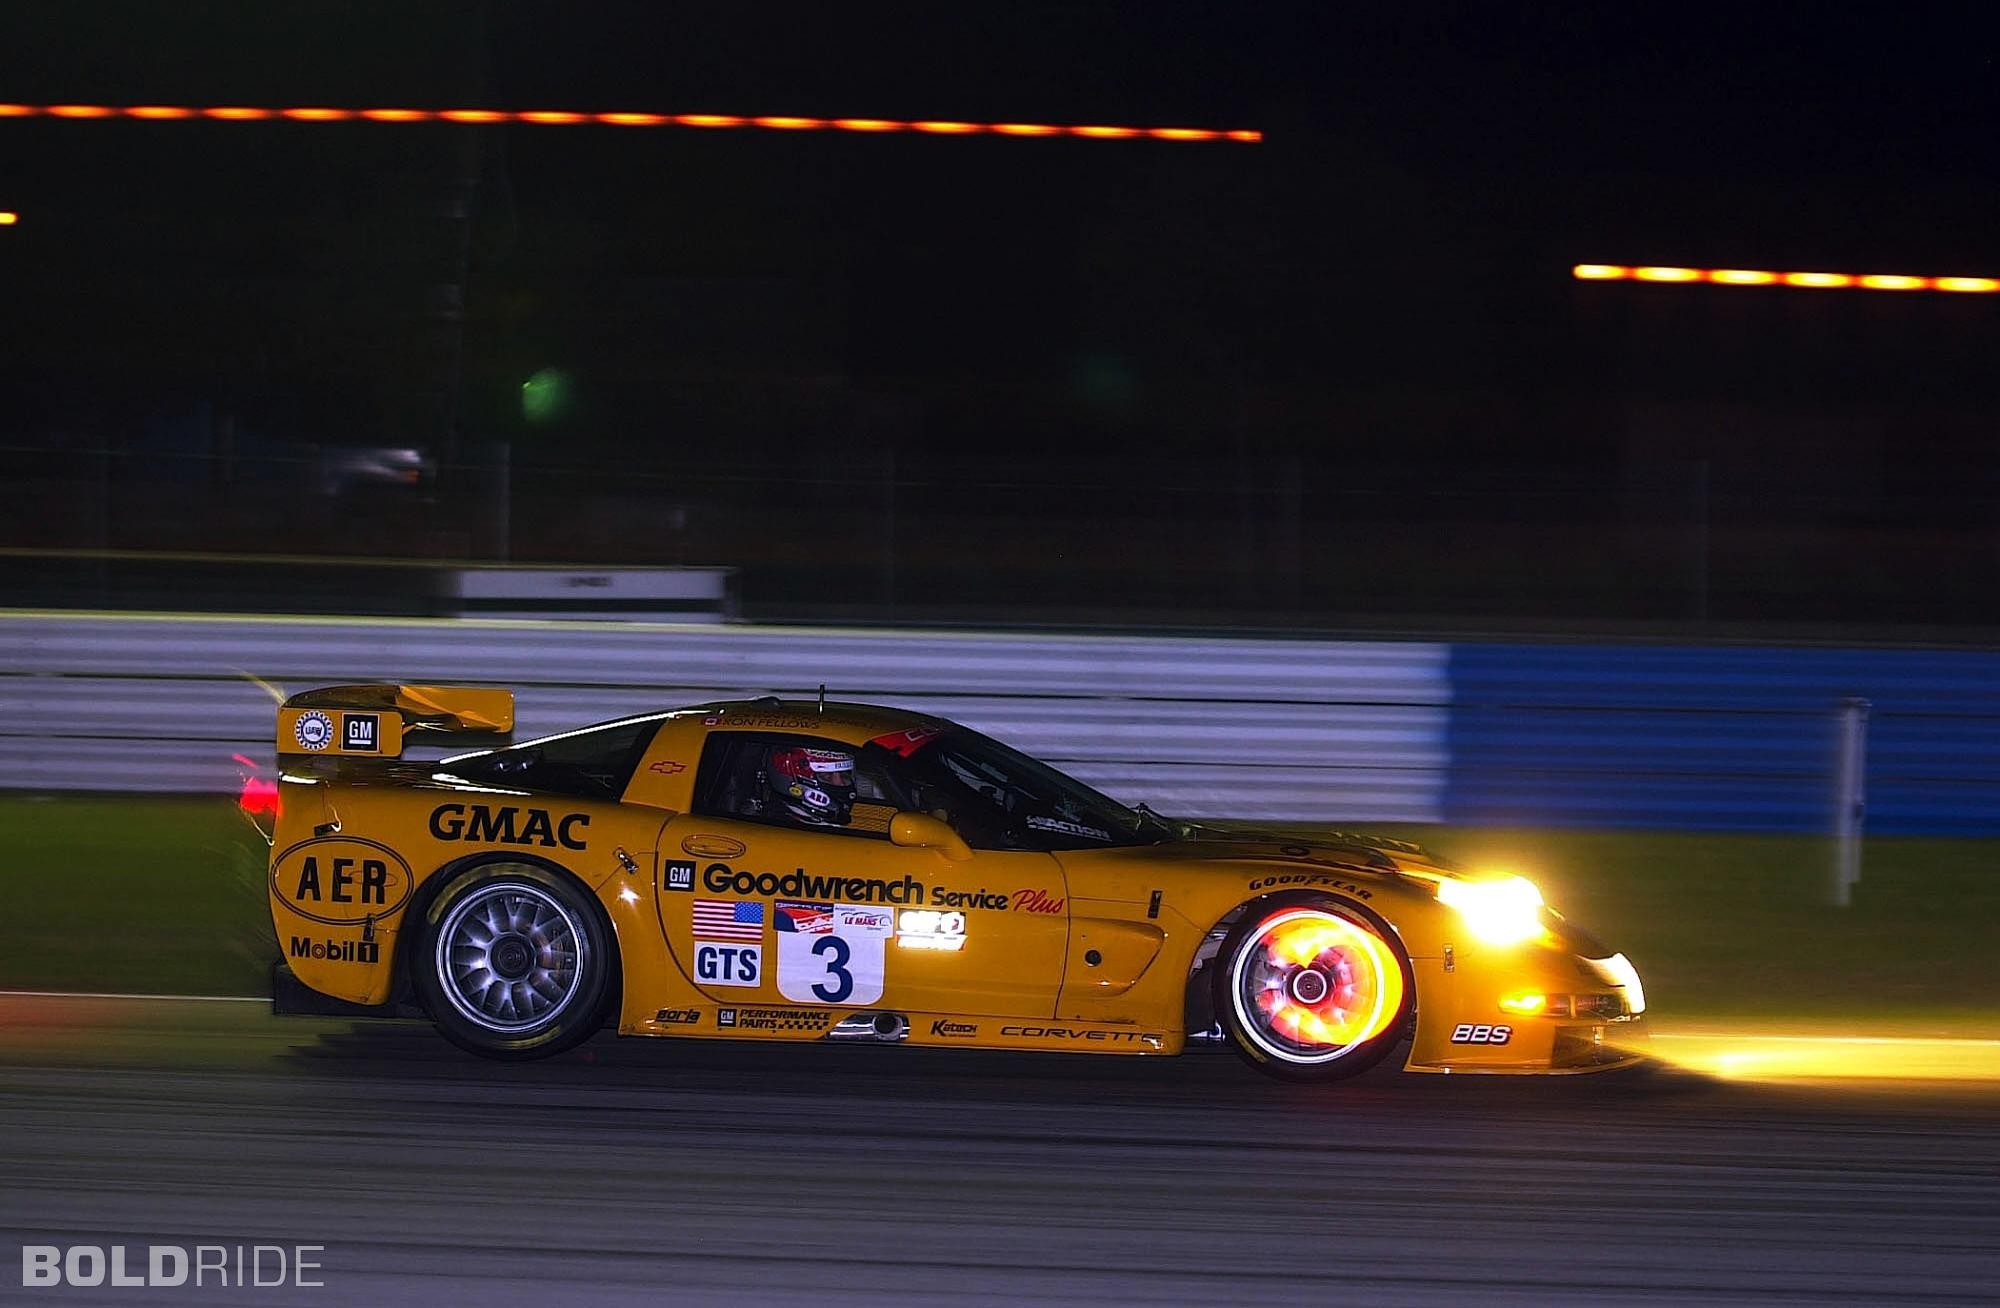 corvette c5 r supercar supercars race racing j wallpaper background - Corvette C5 Logo Wallpaper